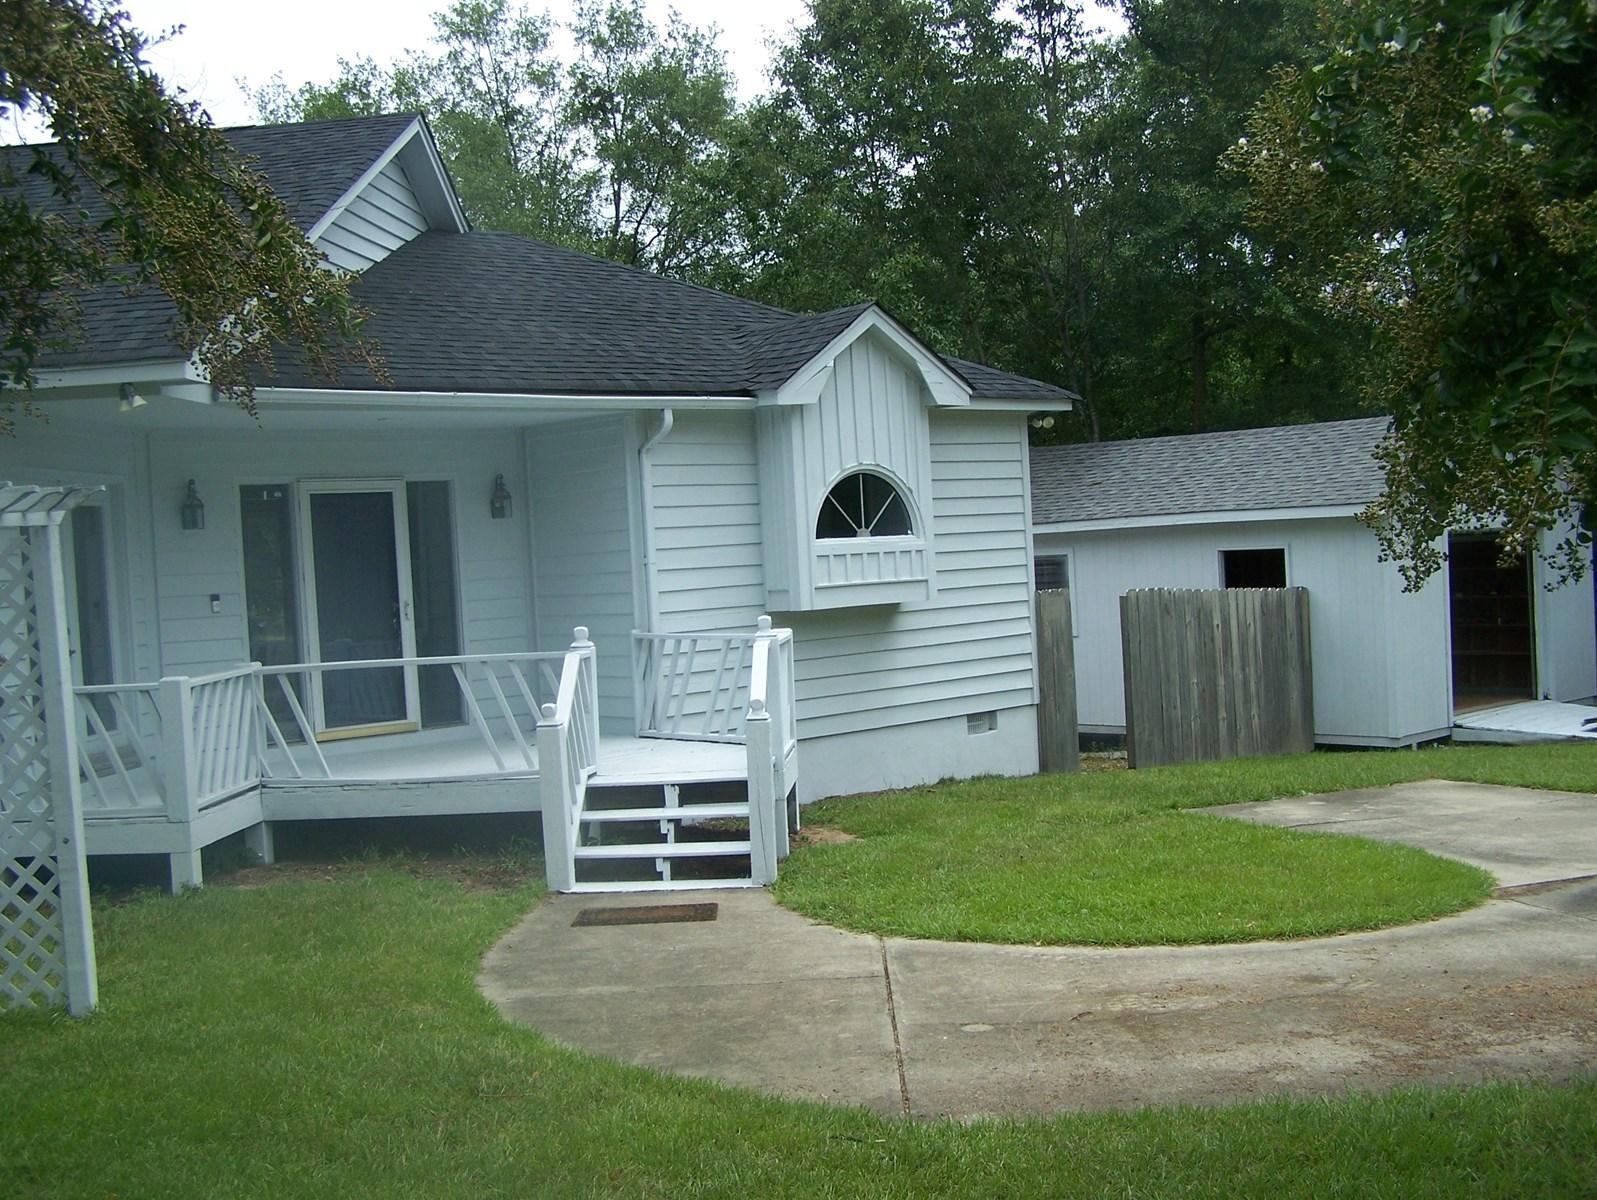 1,700 SQ FT Home on Pond in Lexington, South Carolina